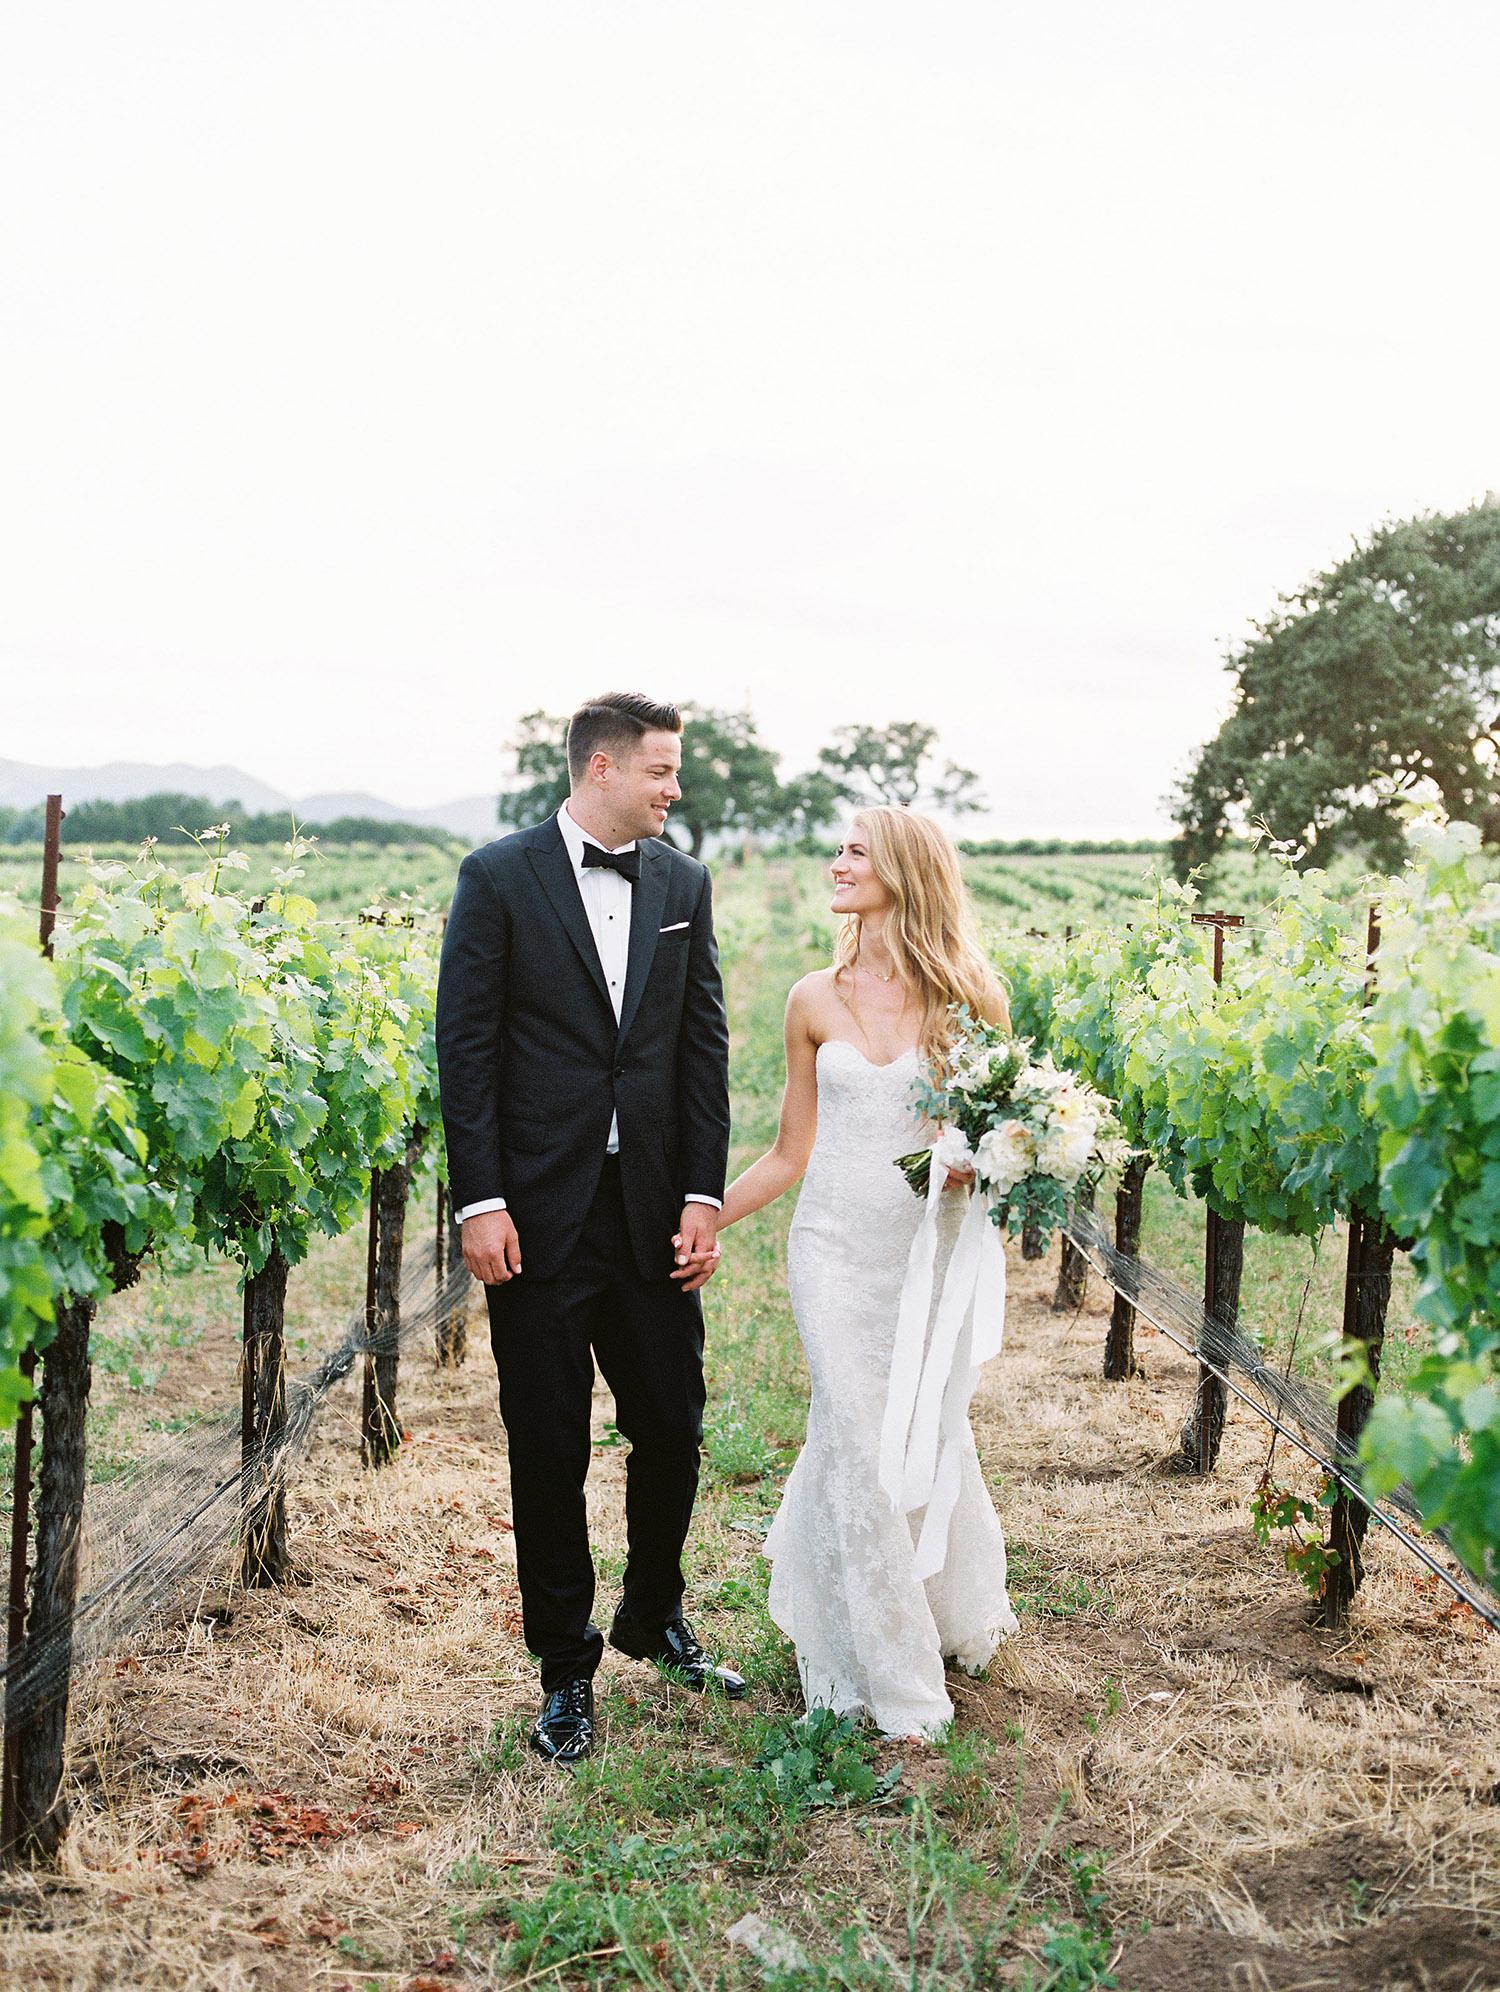 kati erik wedding couple holding hands in vineyard